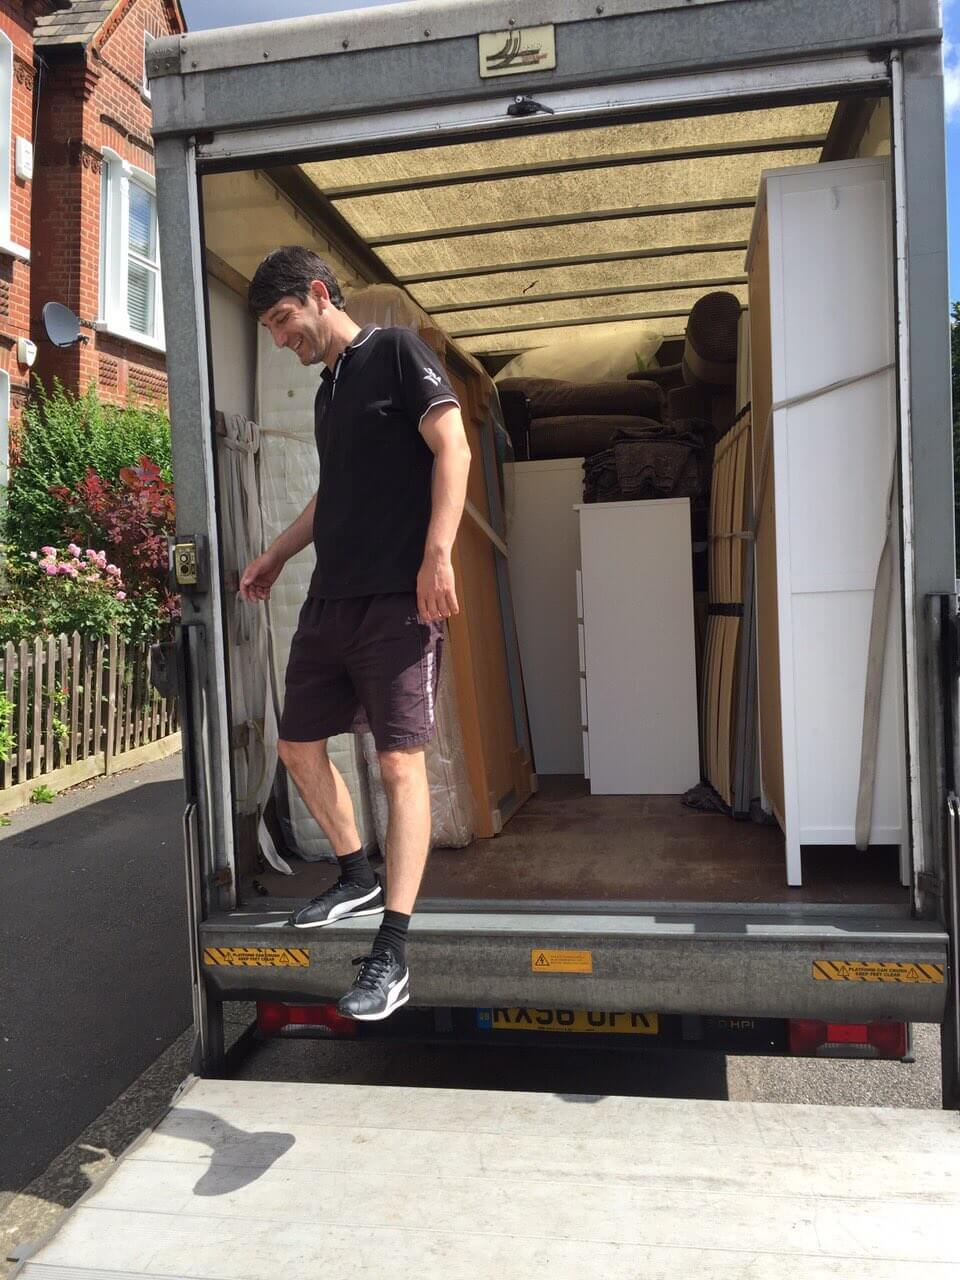 CR0 van for hire in Addington